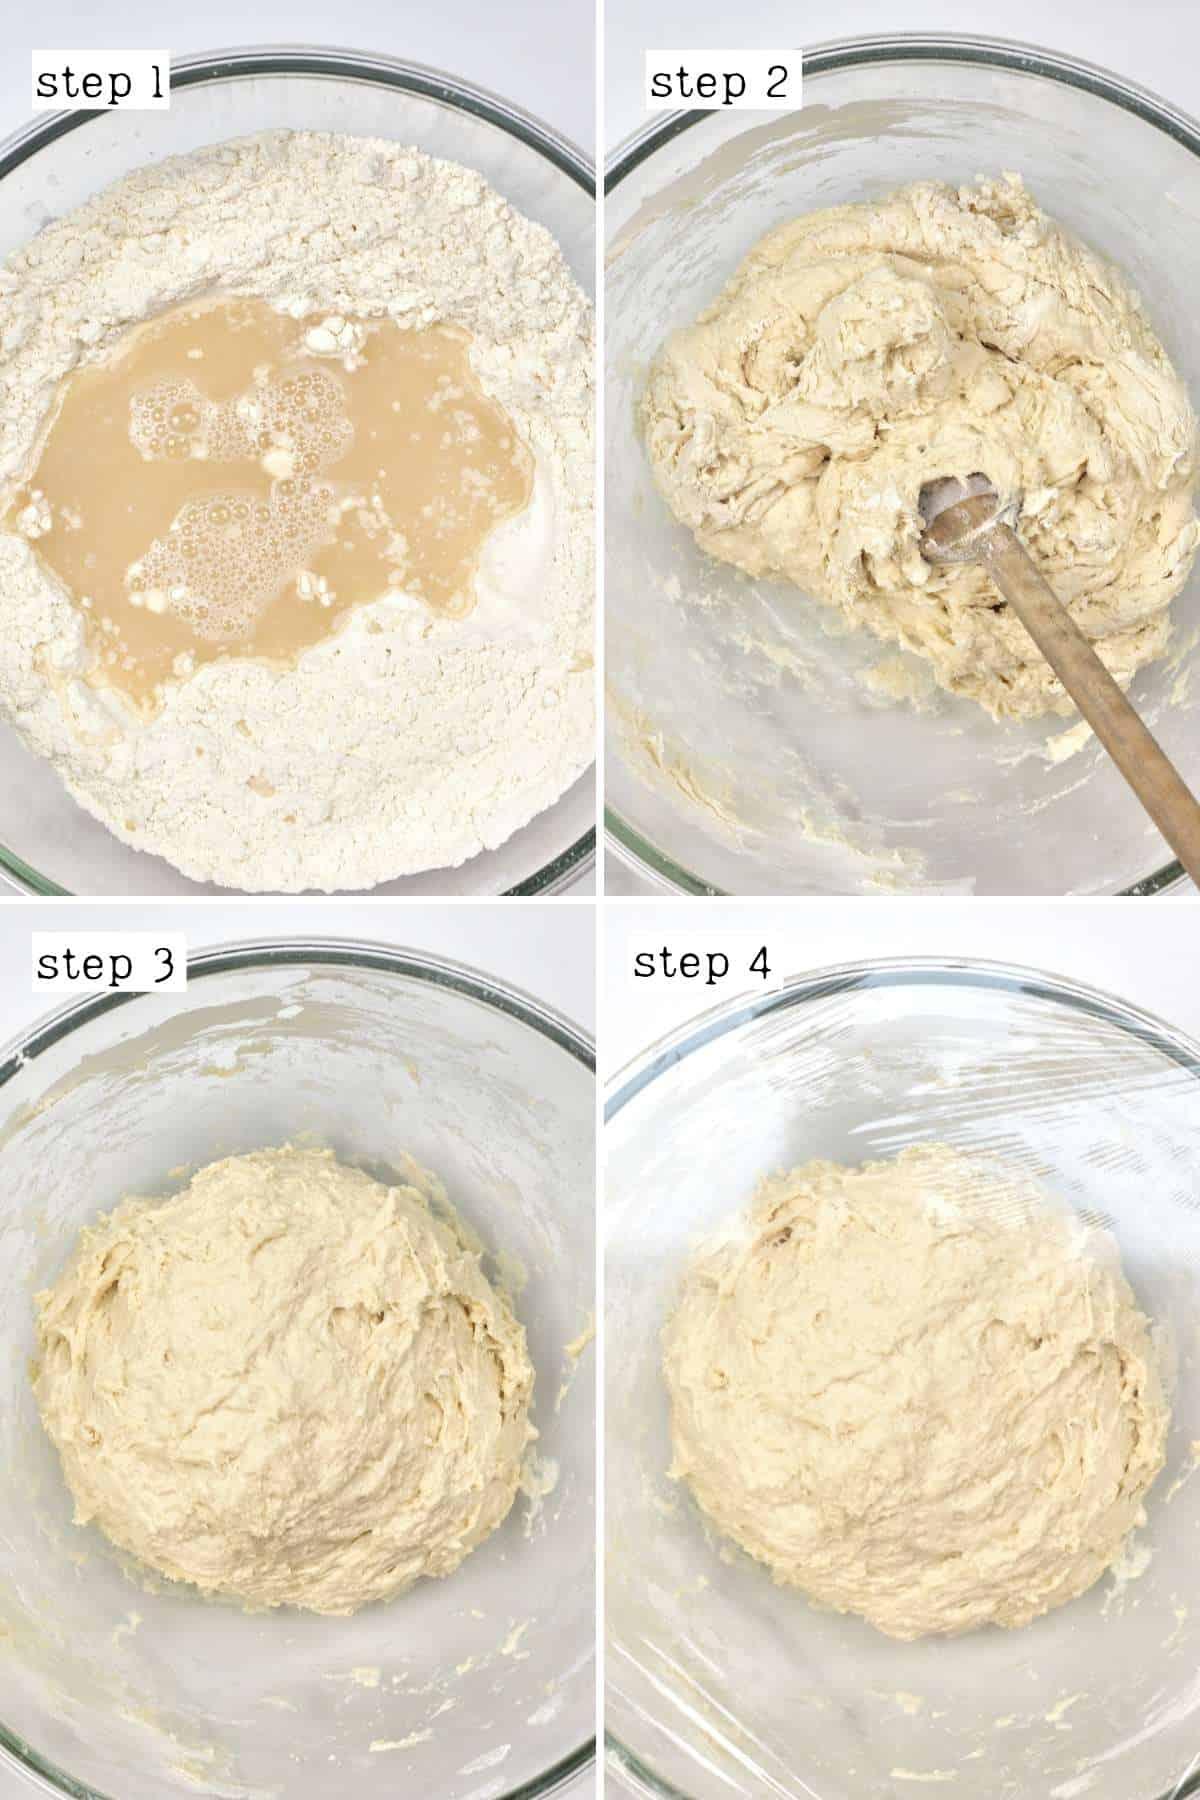 Steps for preparing bread dough